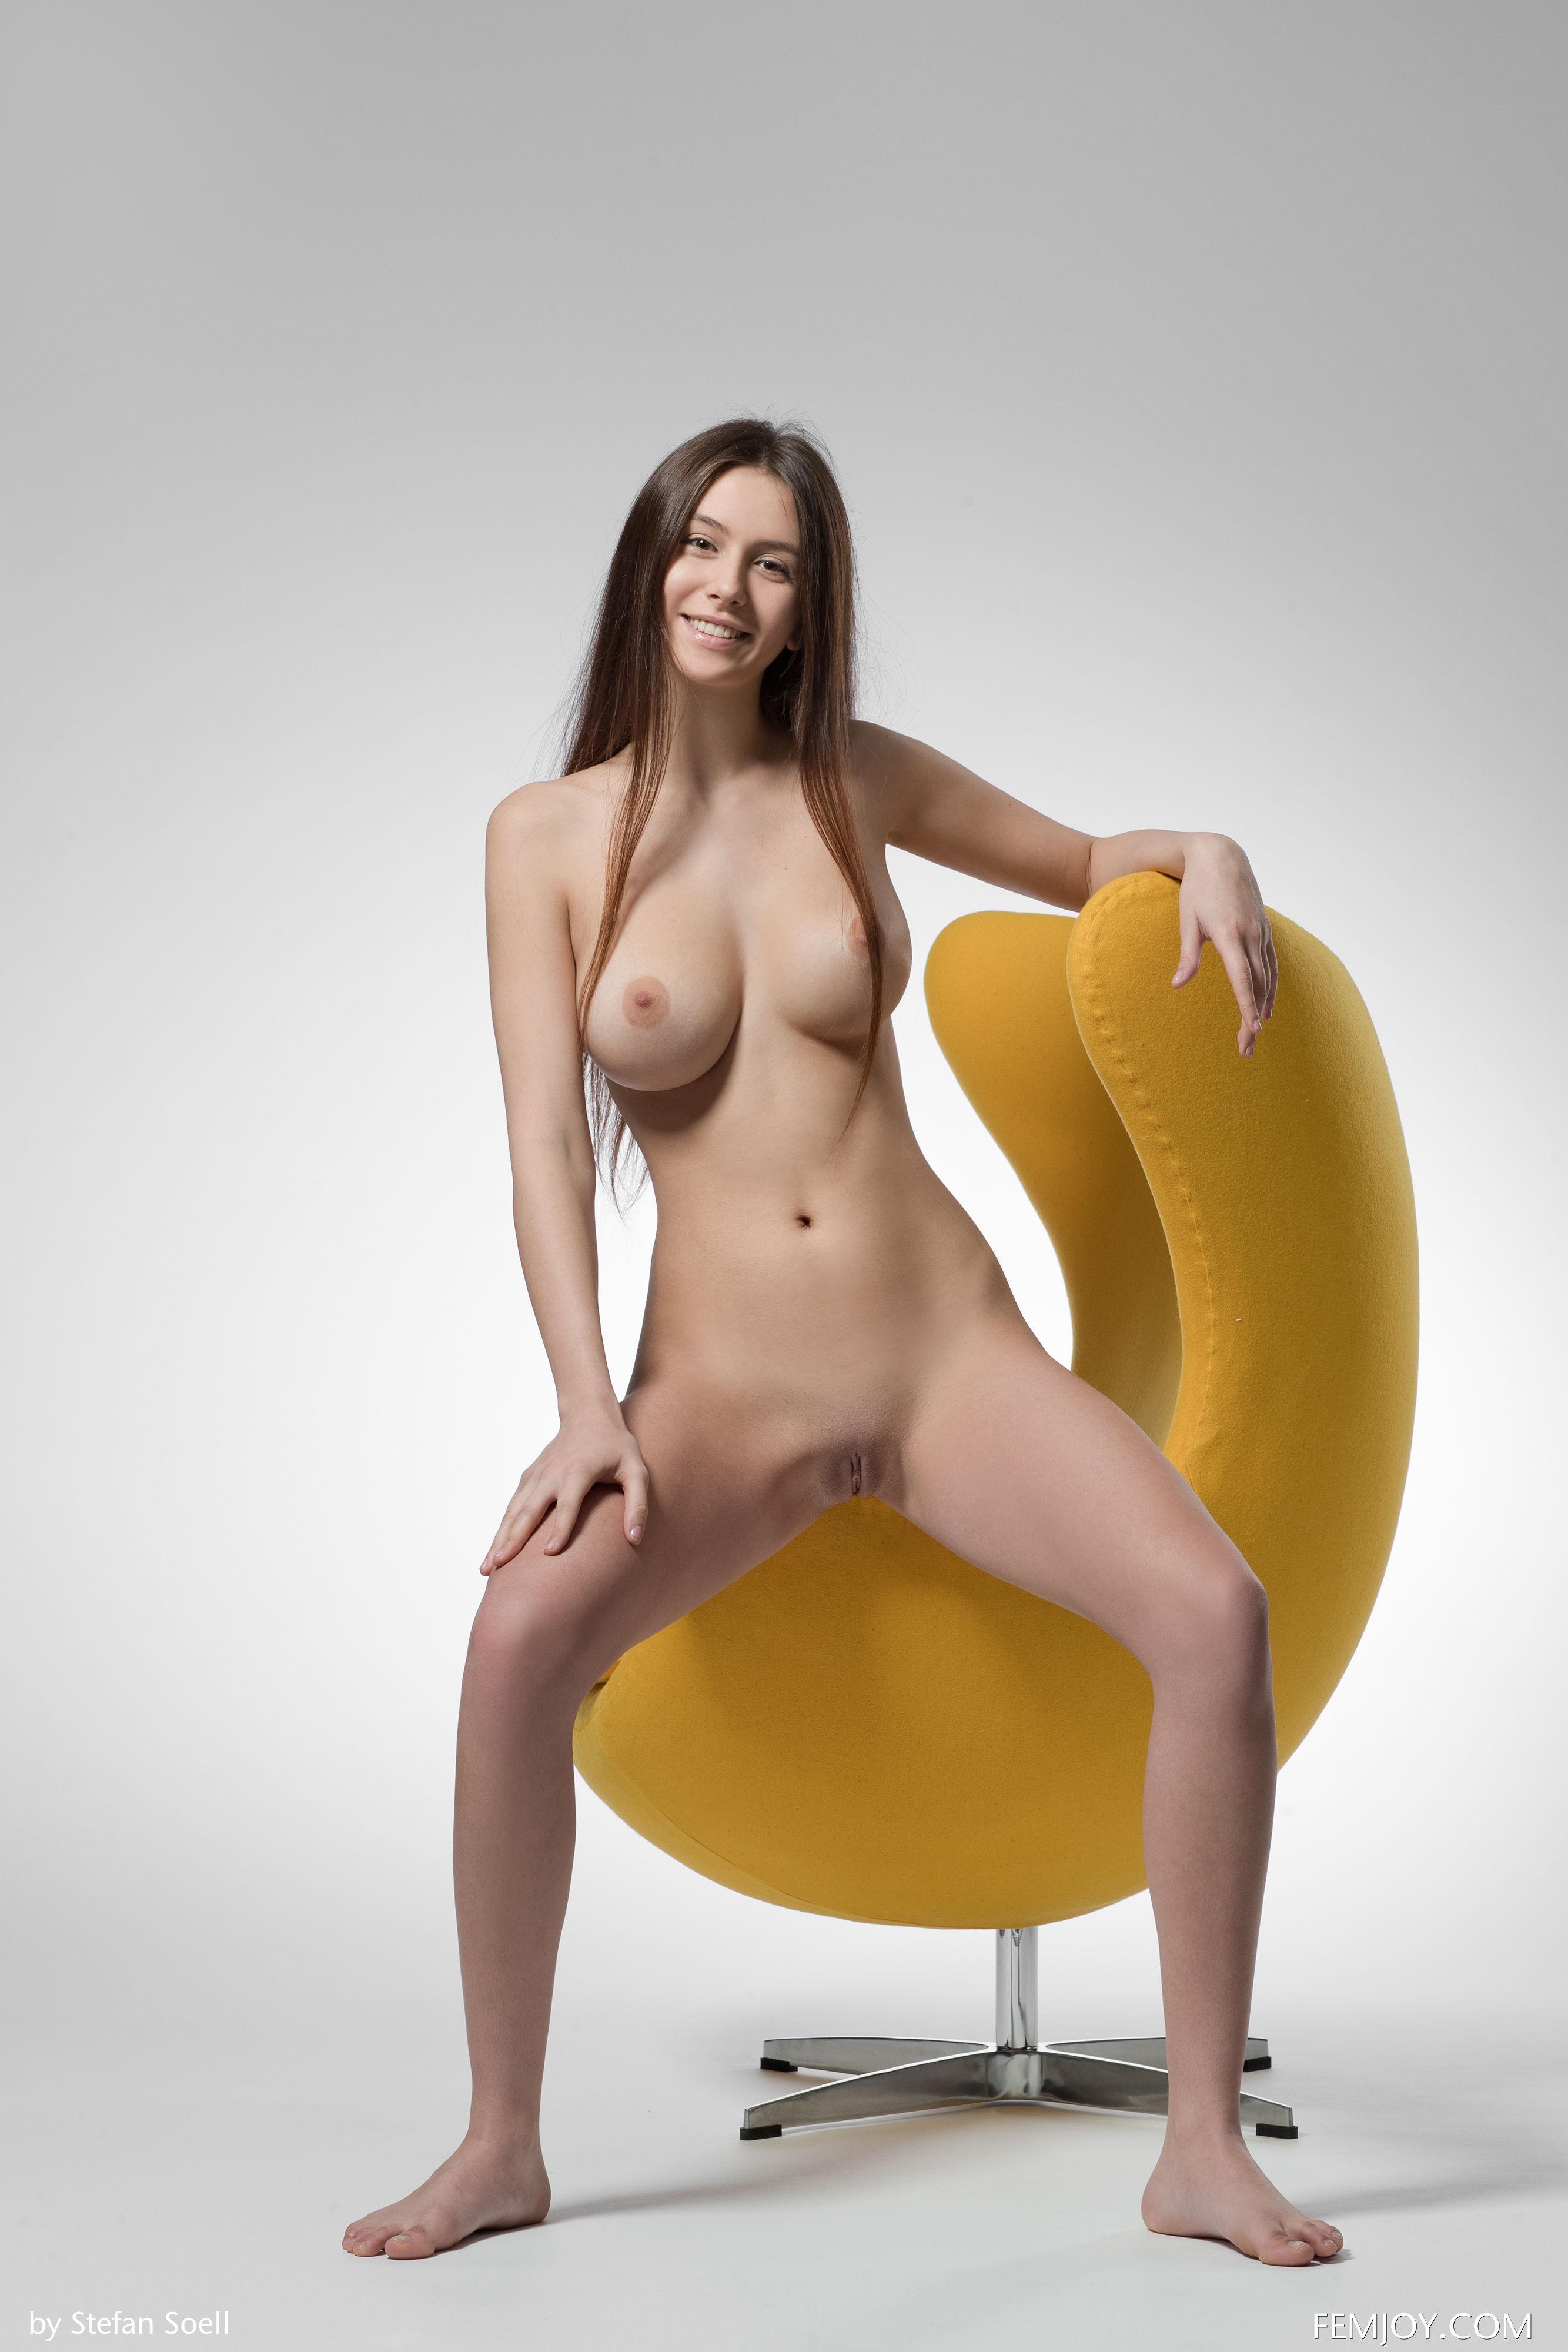 76857652_alisai_femjoy_stefansoell_yellow_19052018p_17.jpg